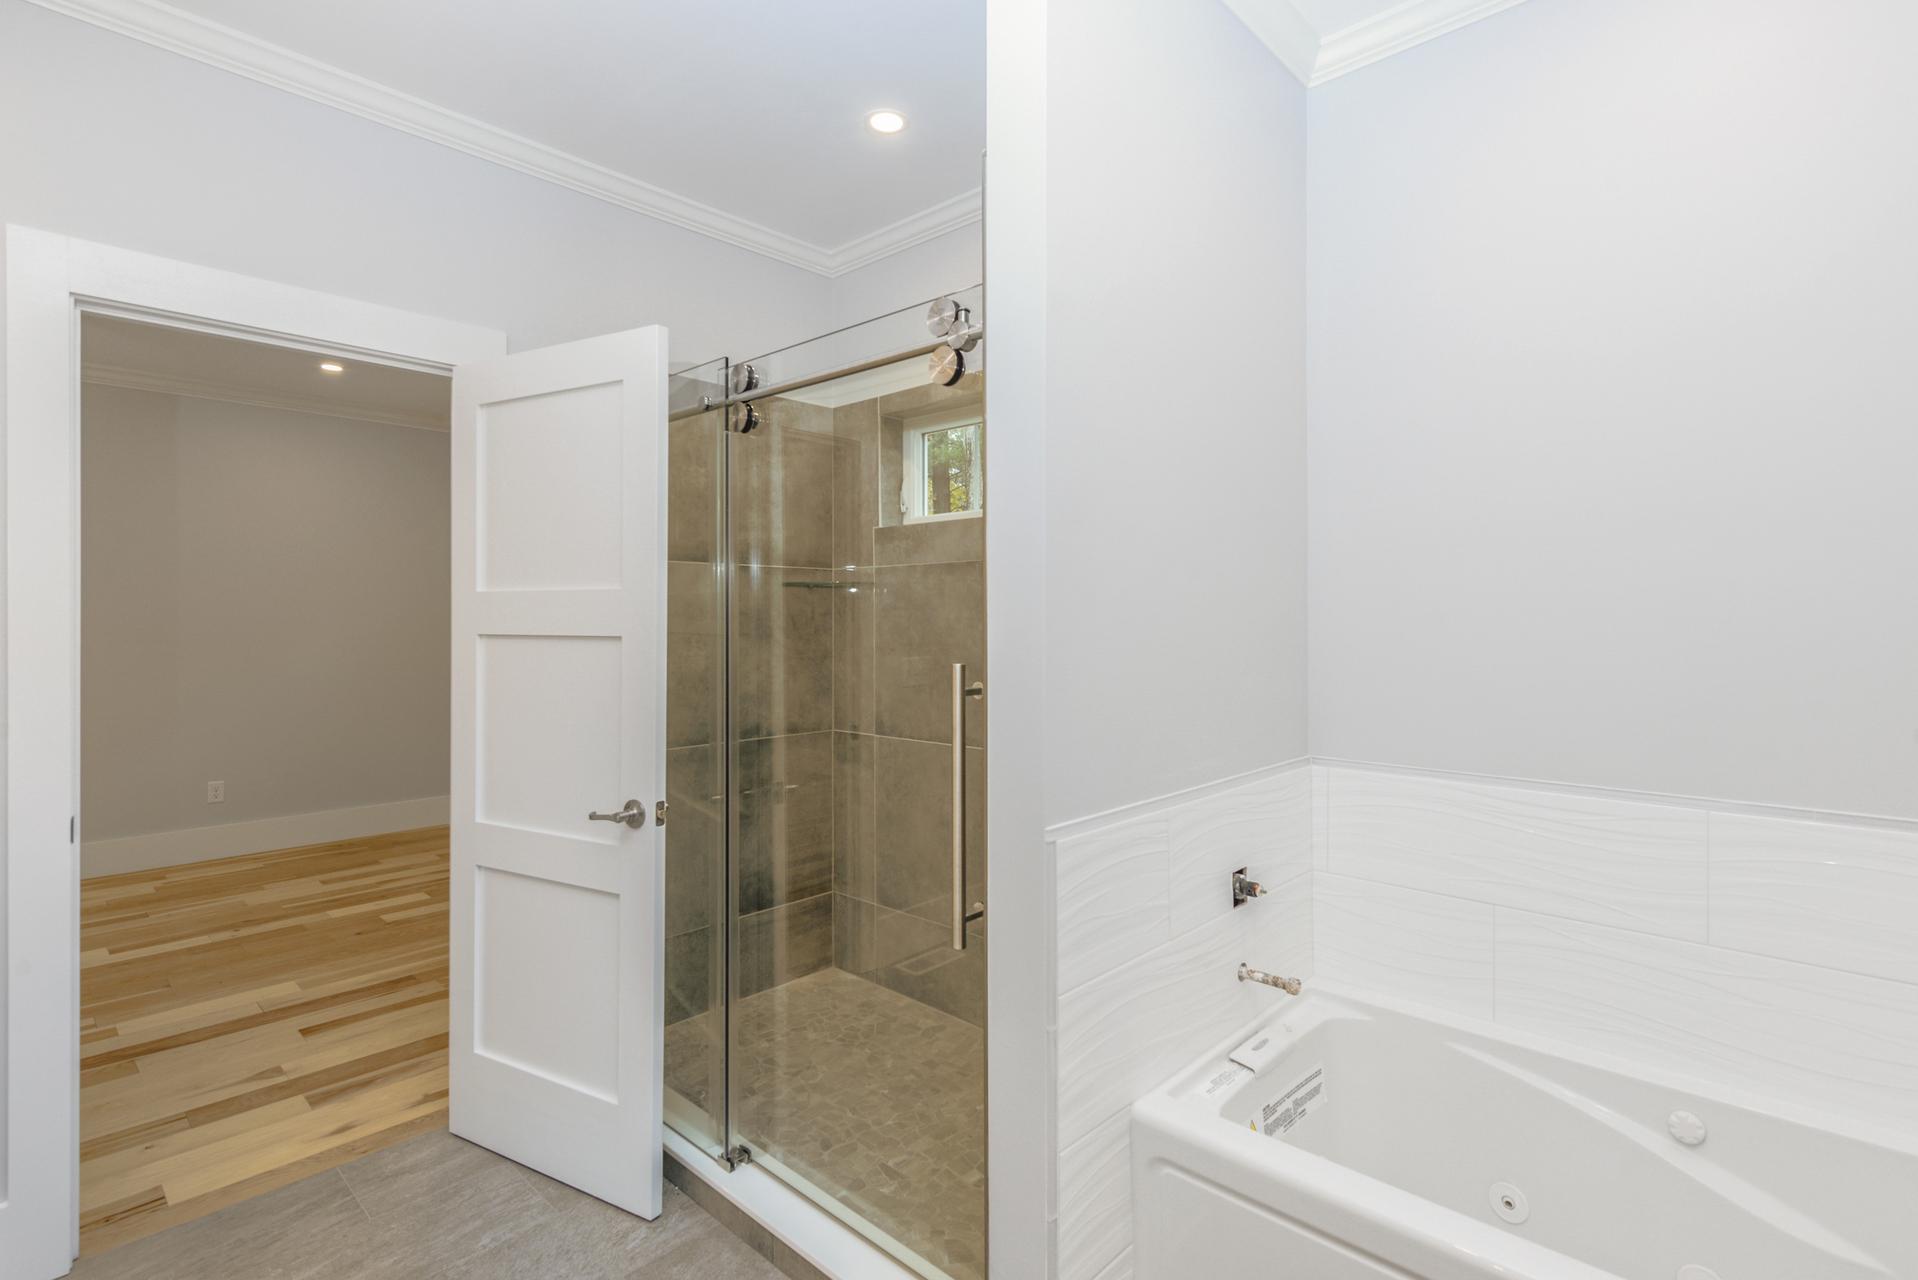 011-photo-master-bathroom-7774186